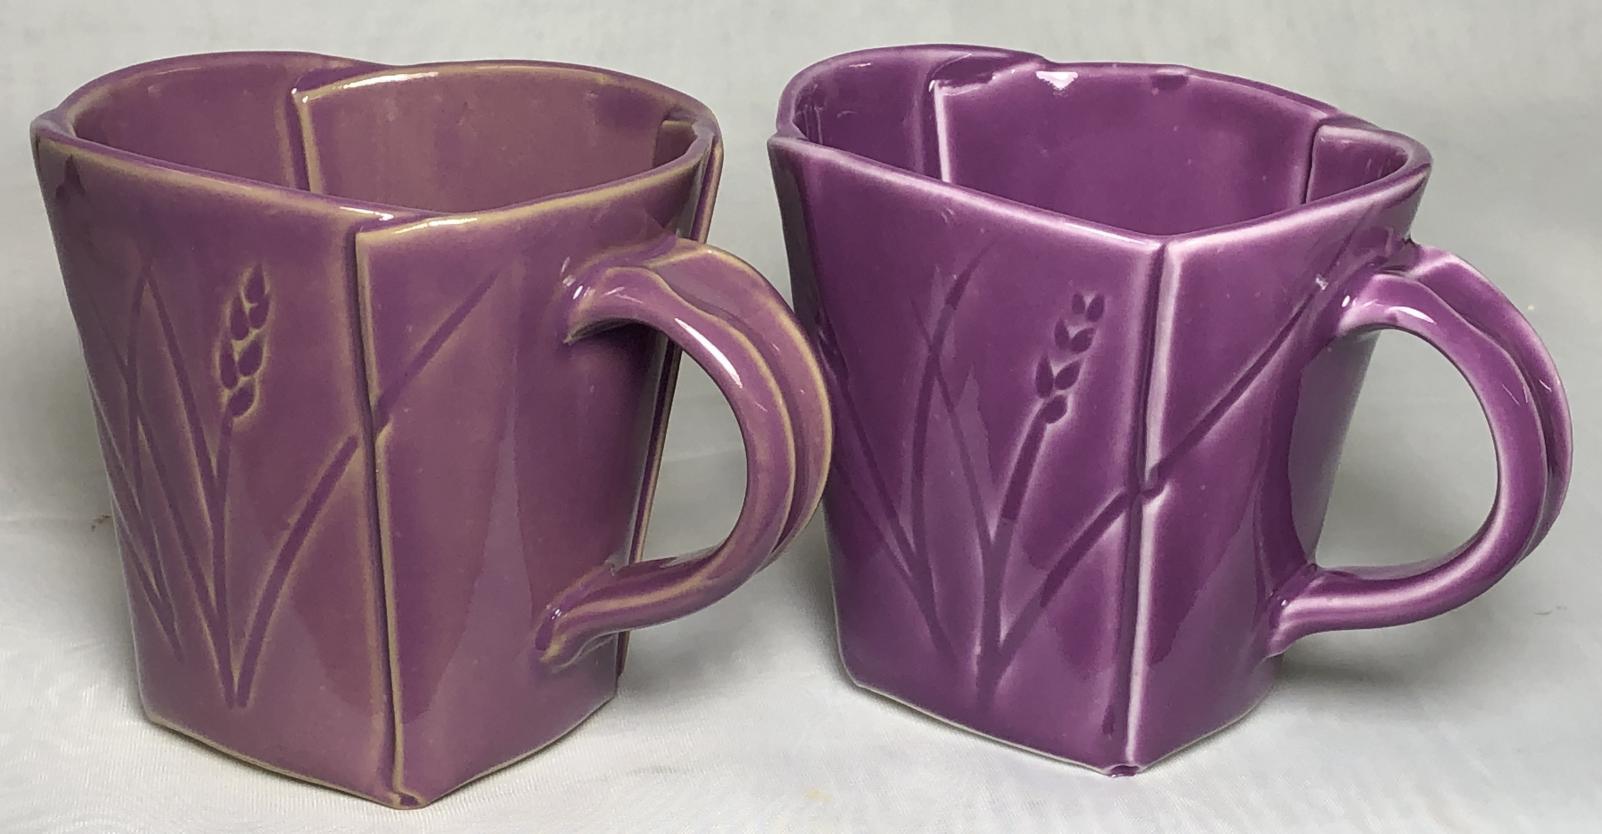 Two purpose ceramic mugs